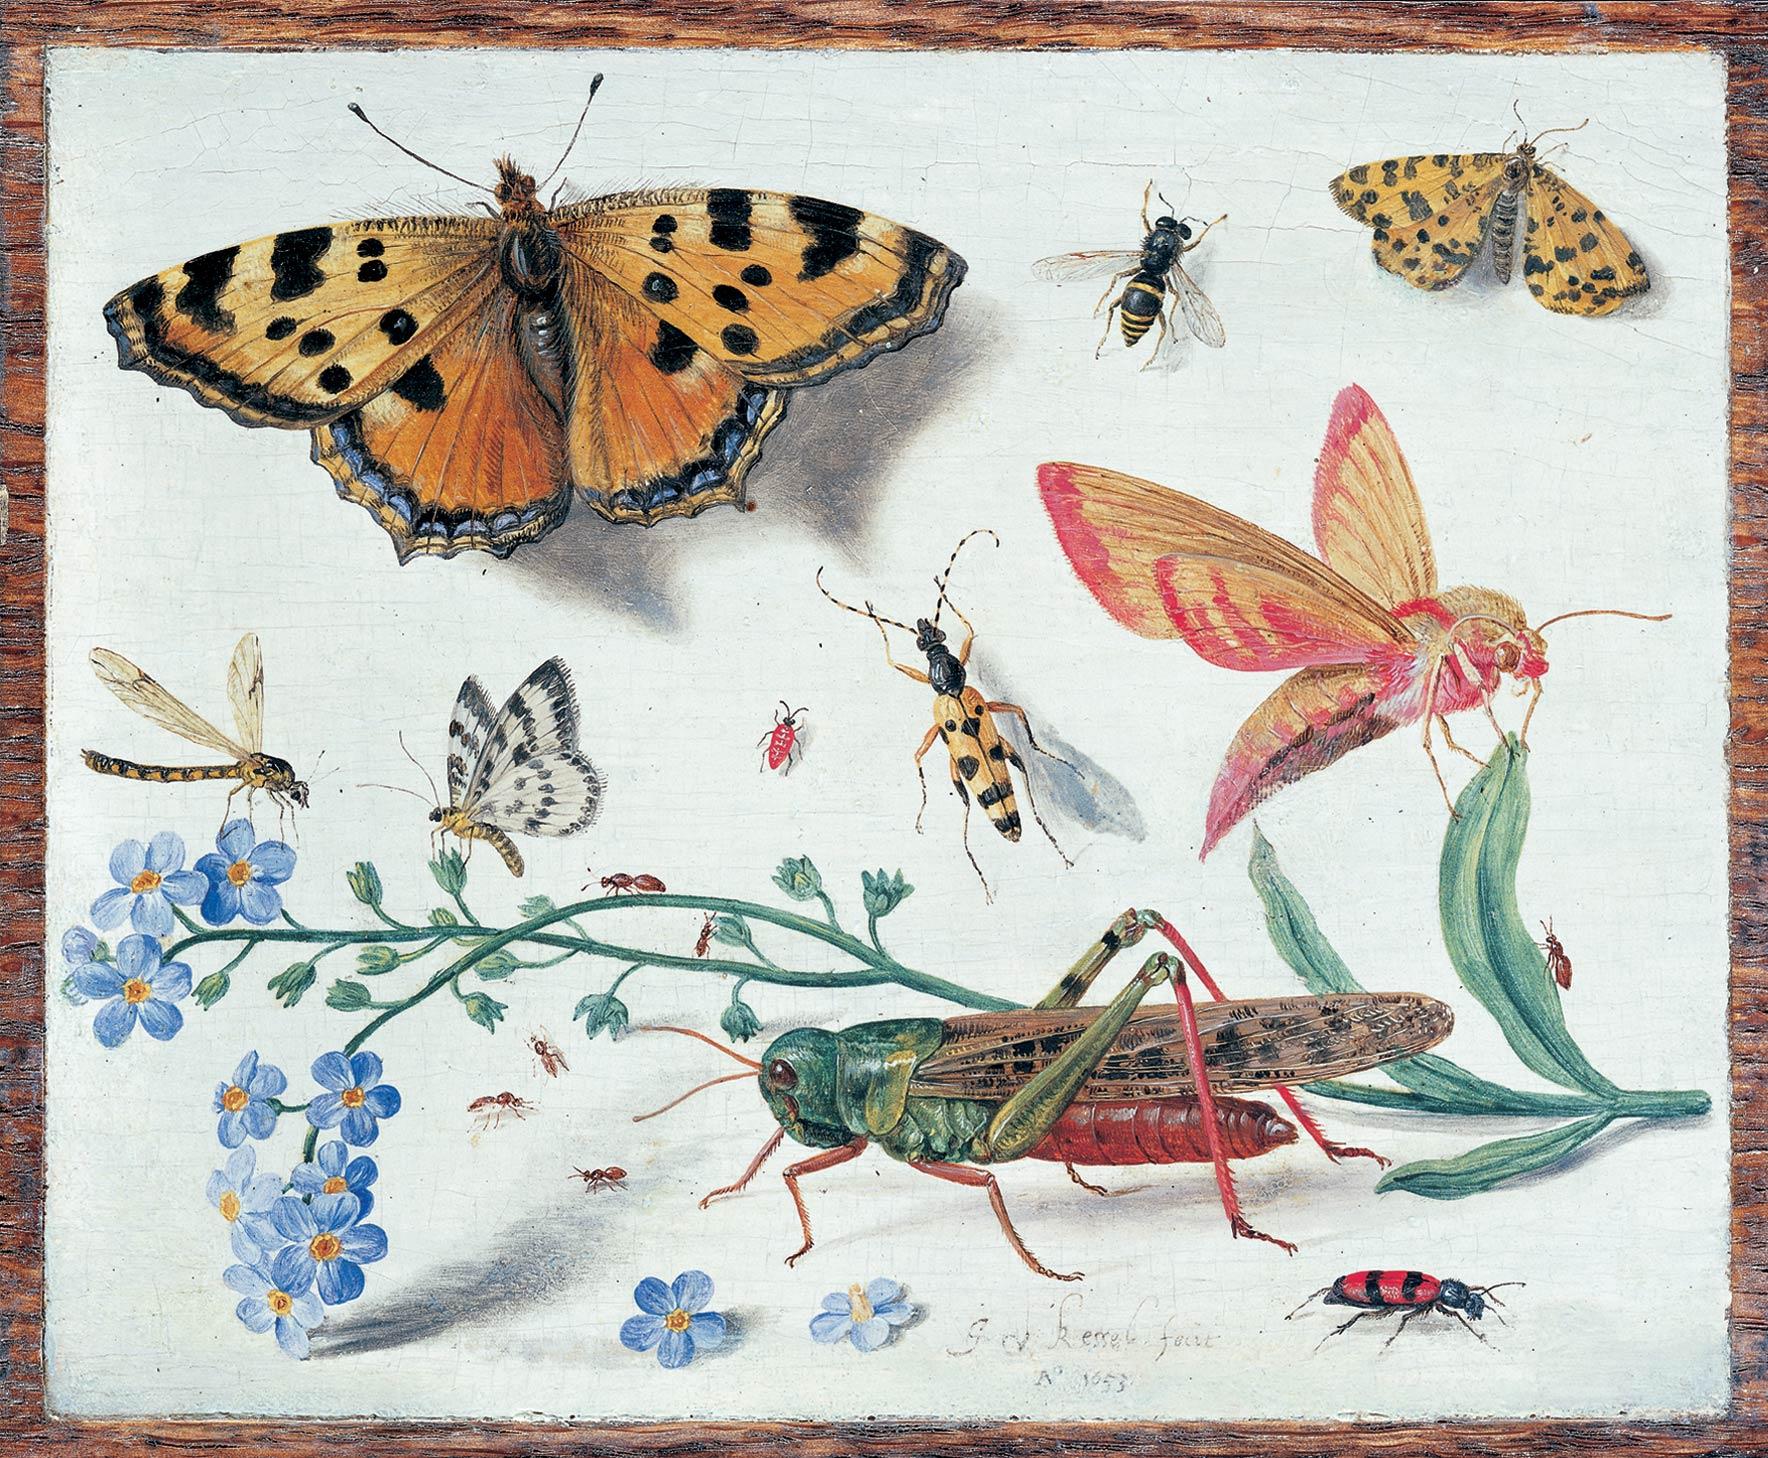 File:Jan van Kessel 001.jpg - Wikimedia Commons